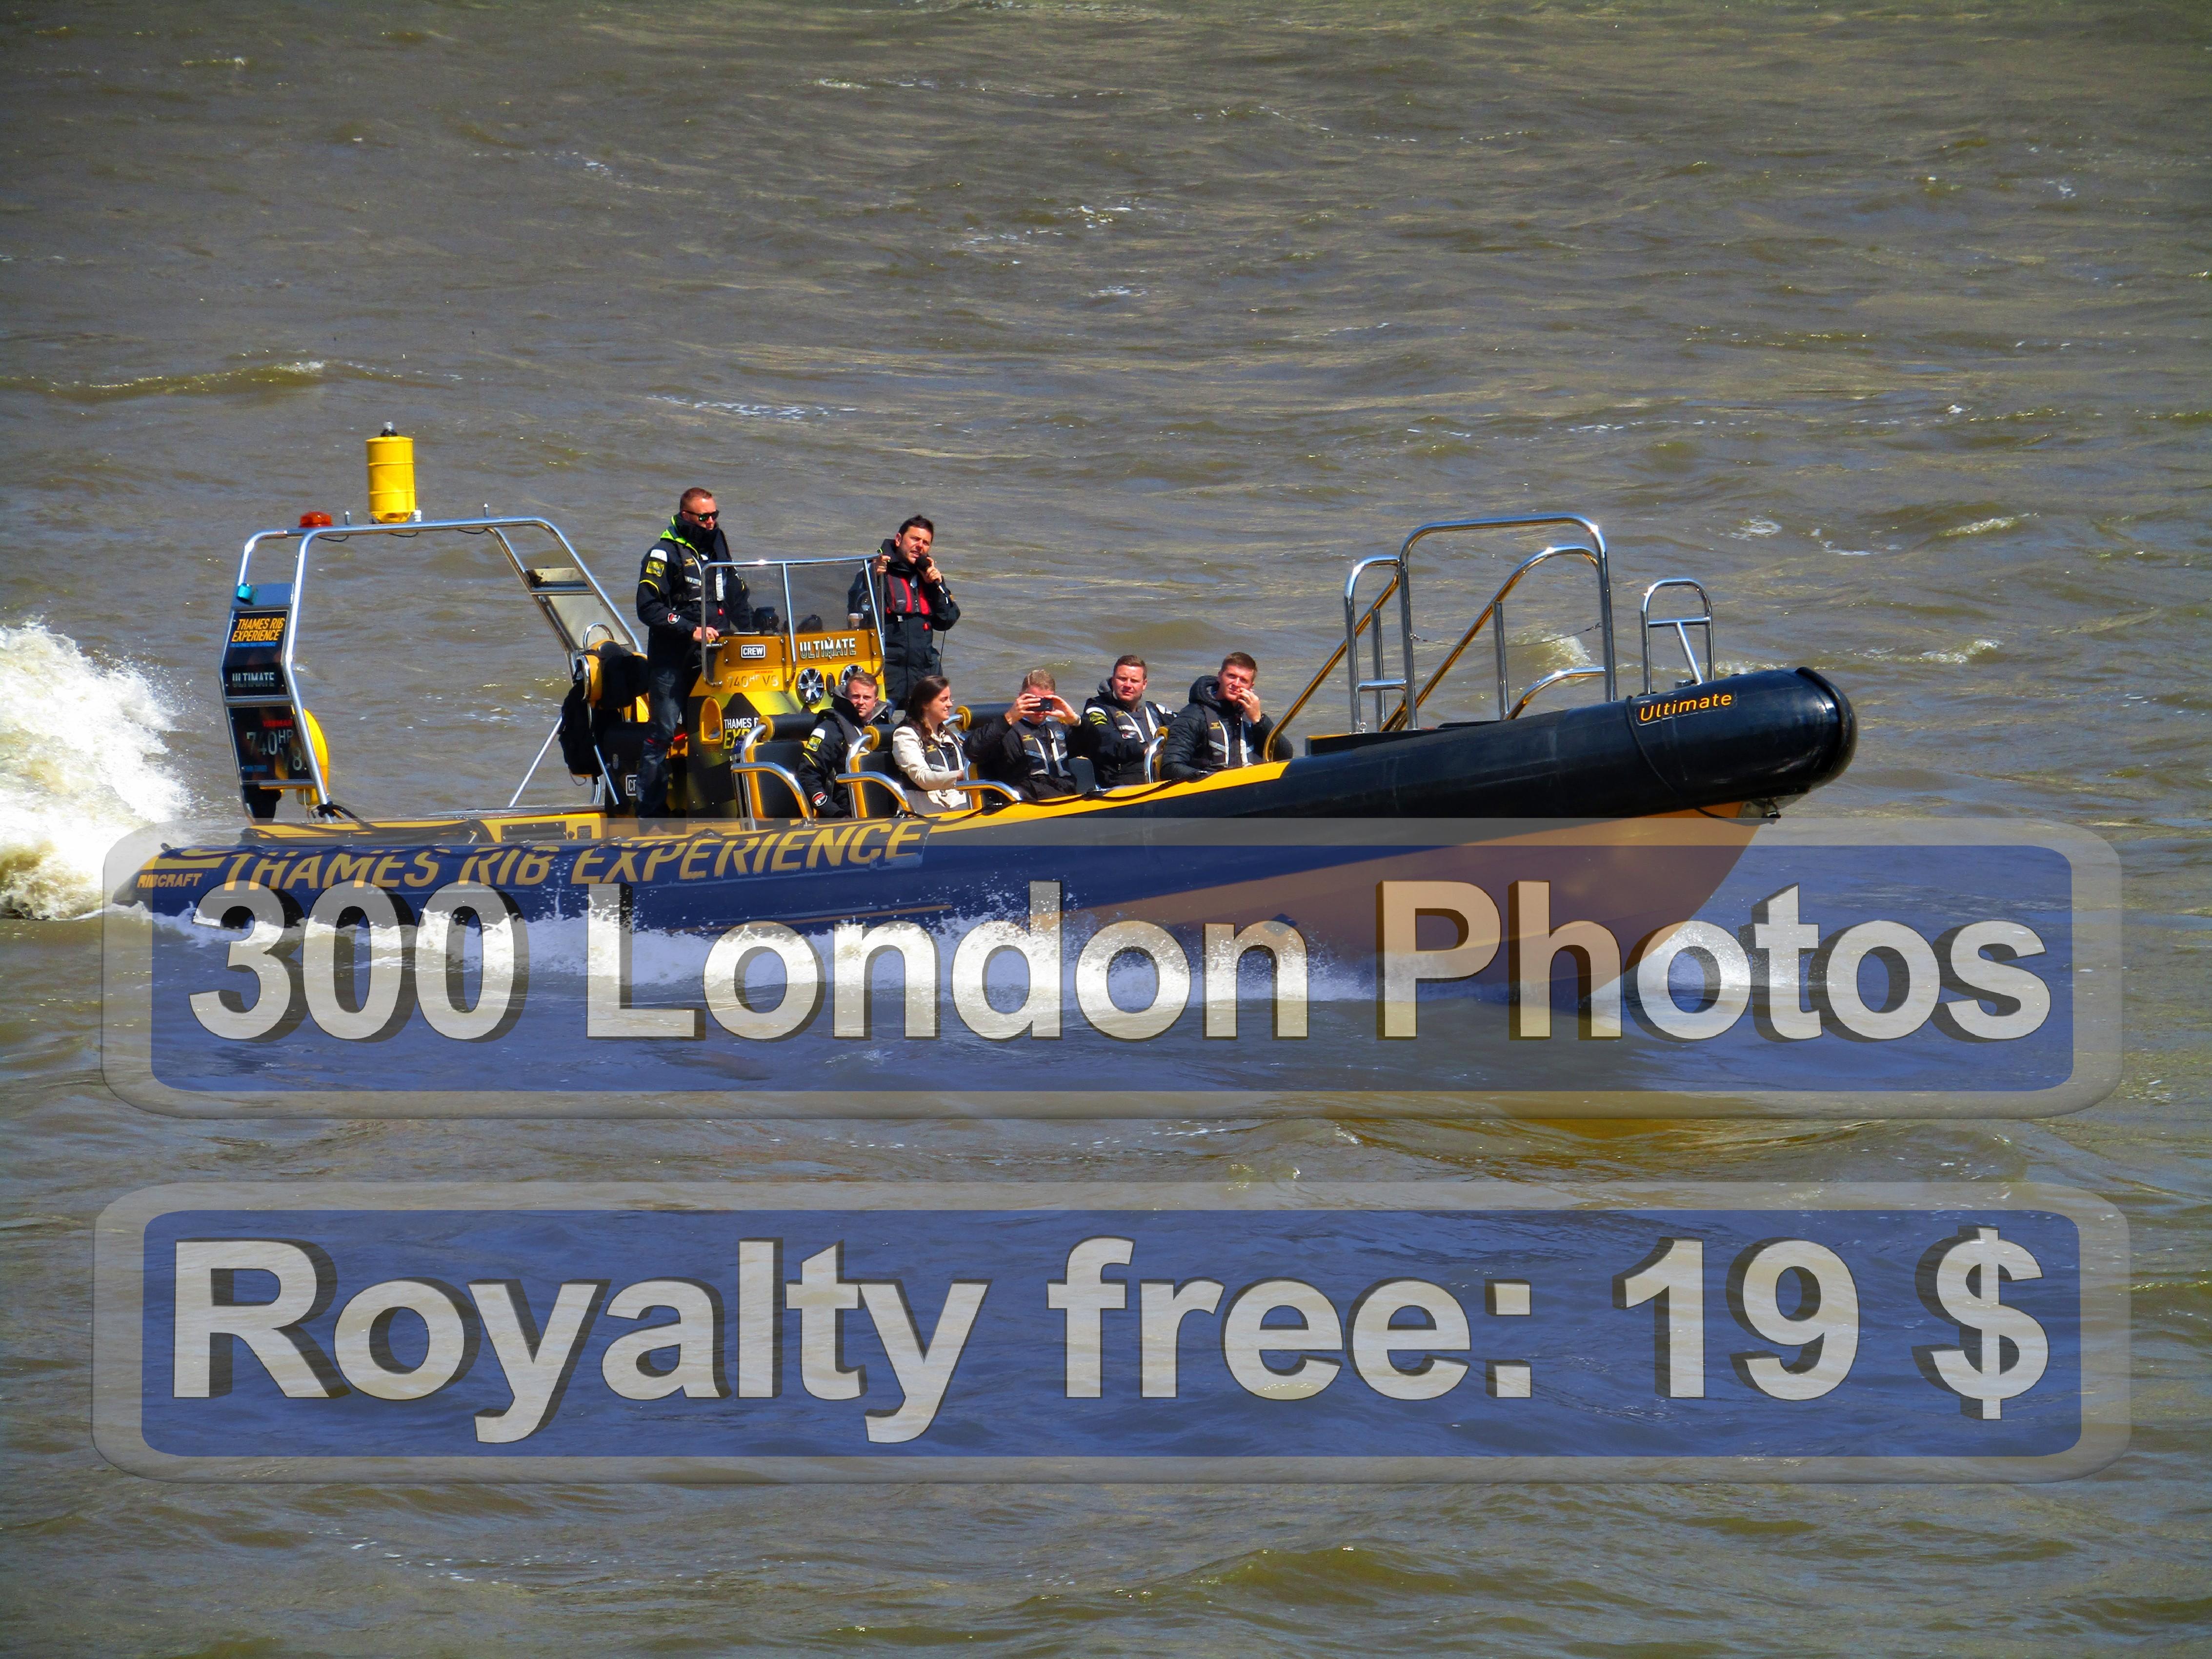 London Photo Equipment